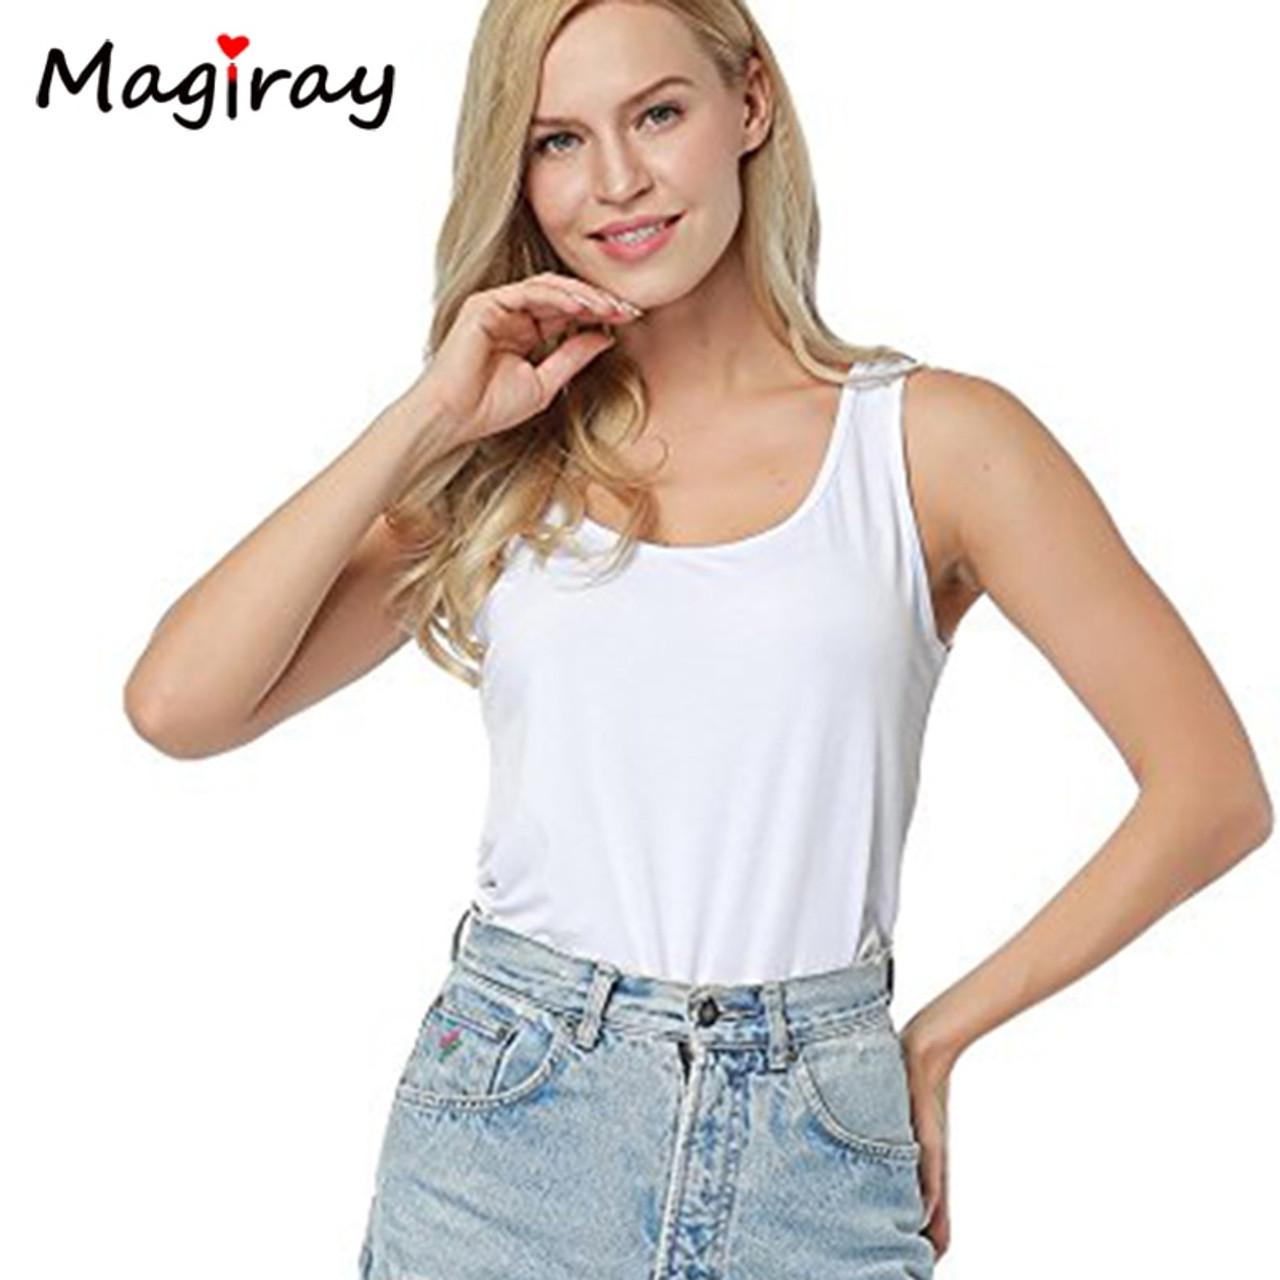 d222b0be4892 ... Magiray Scrop Neck Plain Tank Bodysuit Women 2019 New Sexy Body Top  White Sleeveless U- ...